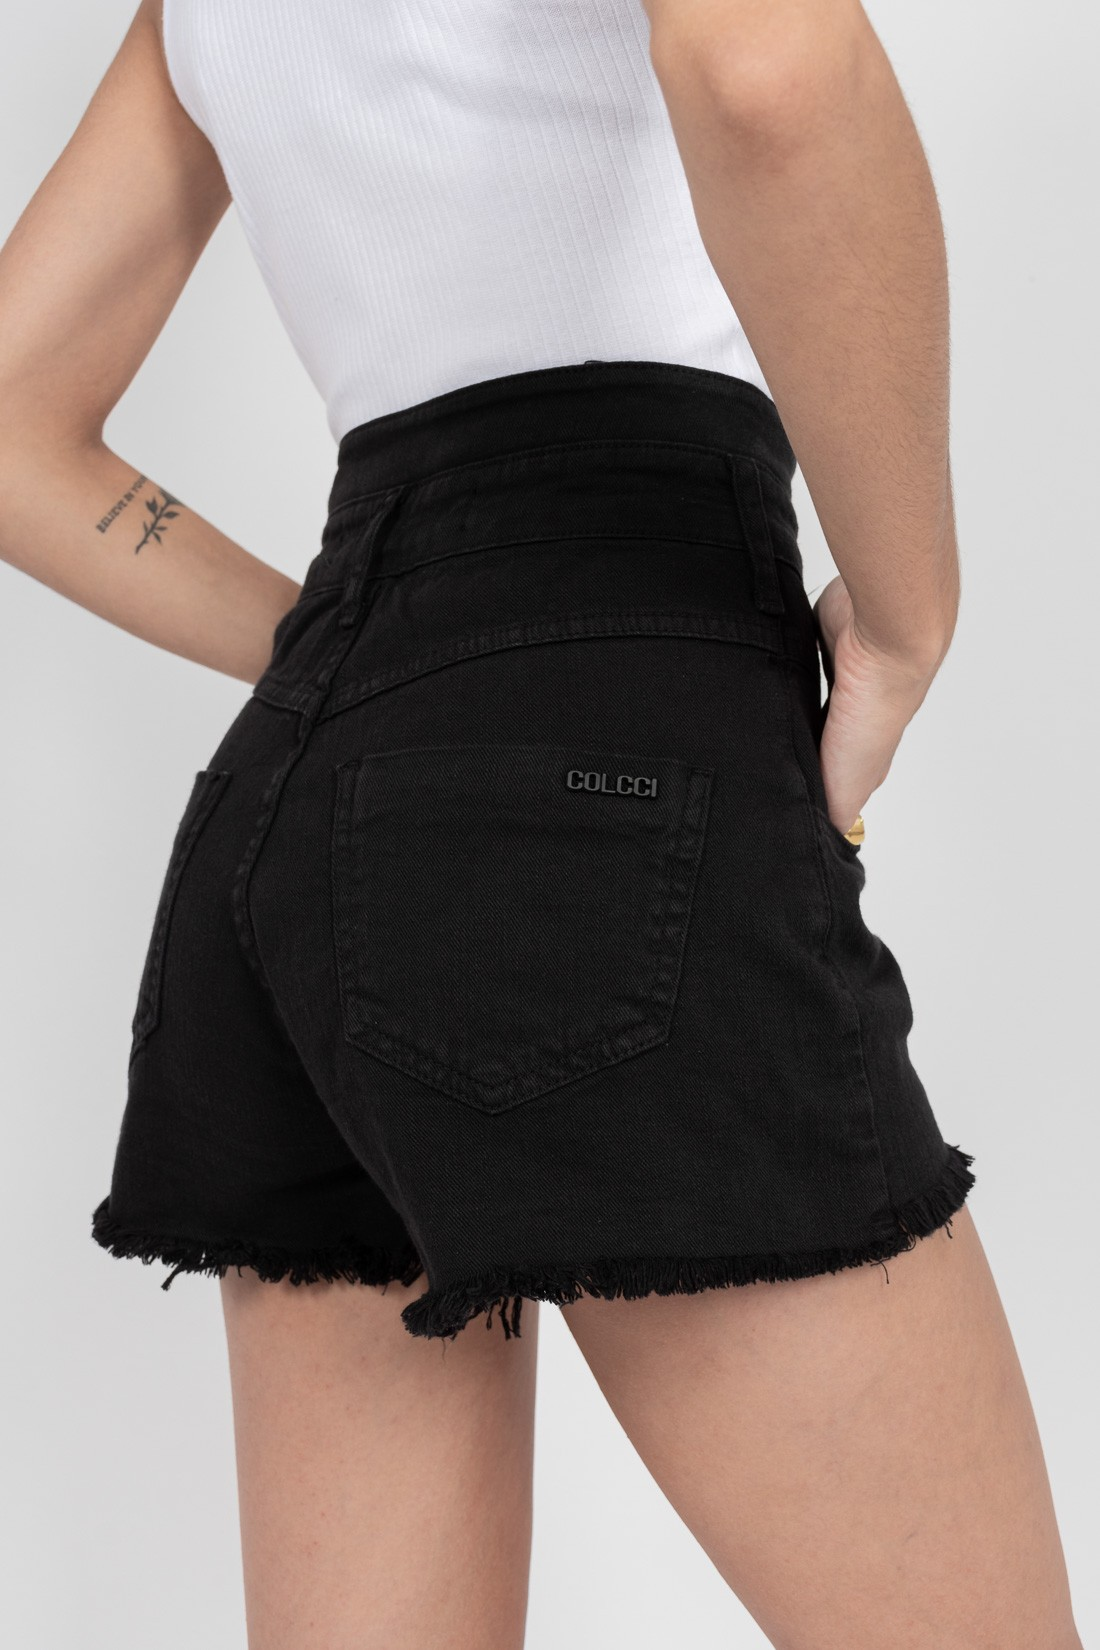 Shorts Colcci Tay